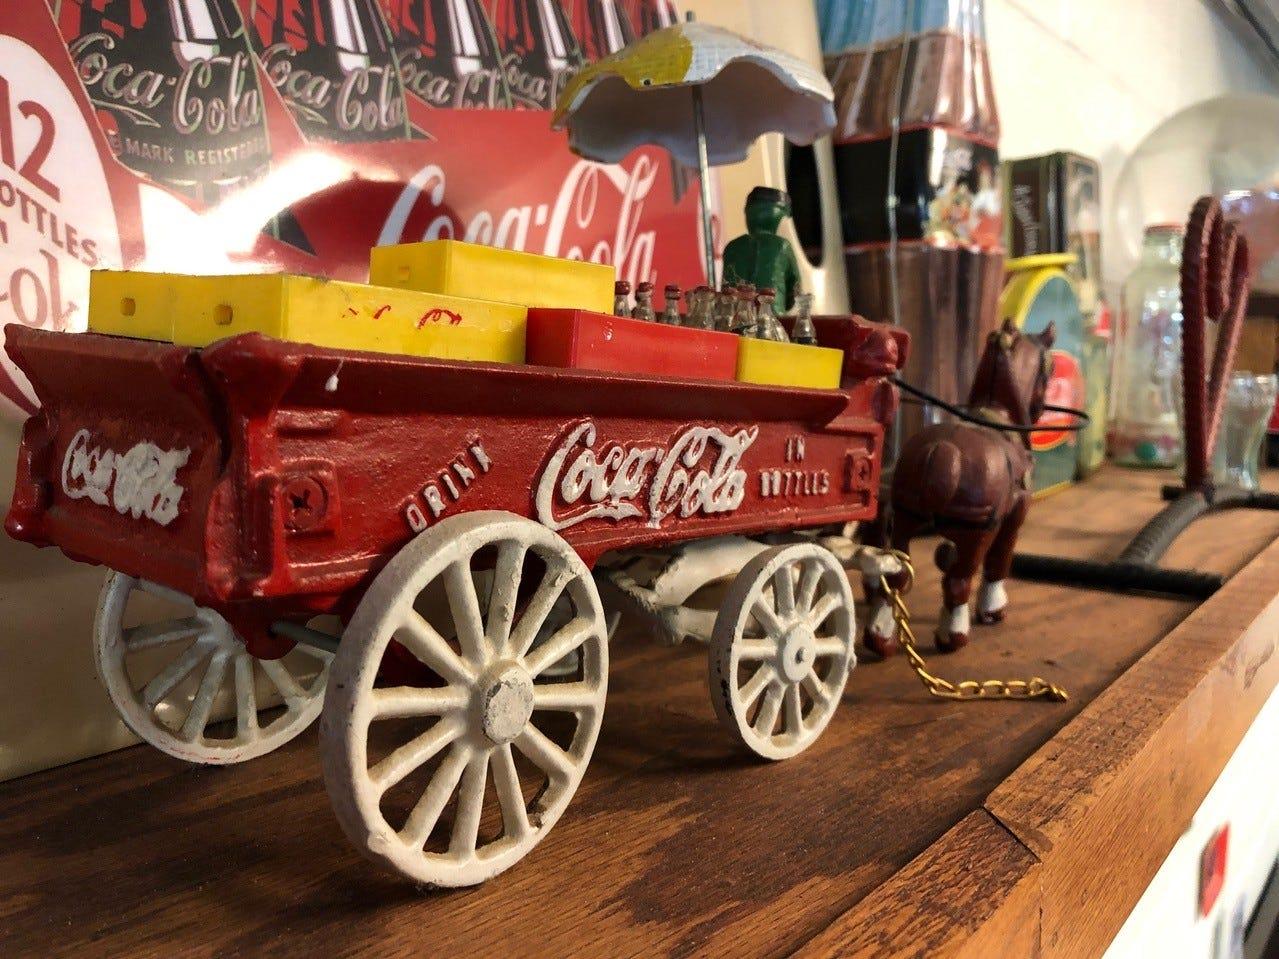 Some of the Coca-Cola decor at Rita's Kitchen in east Redding.